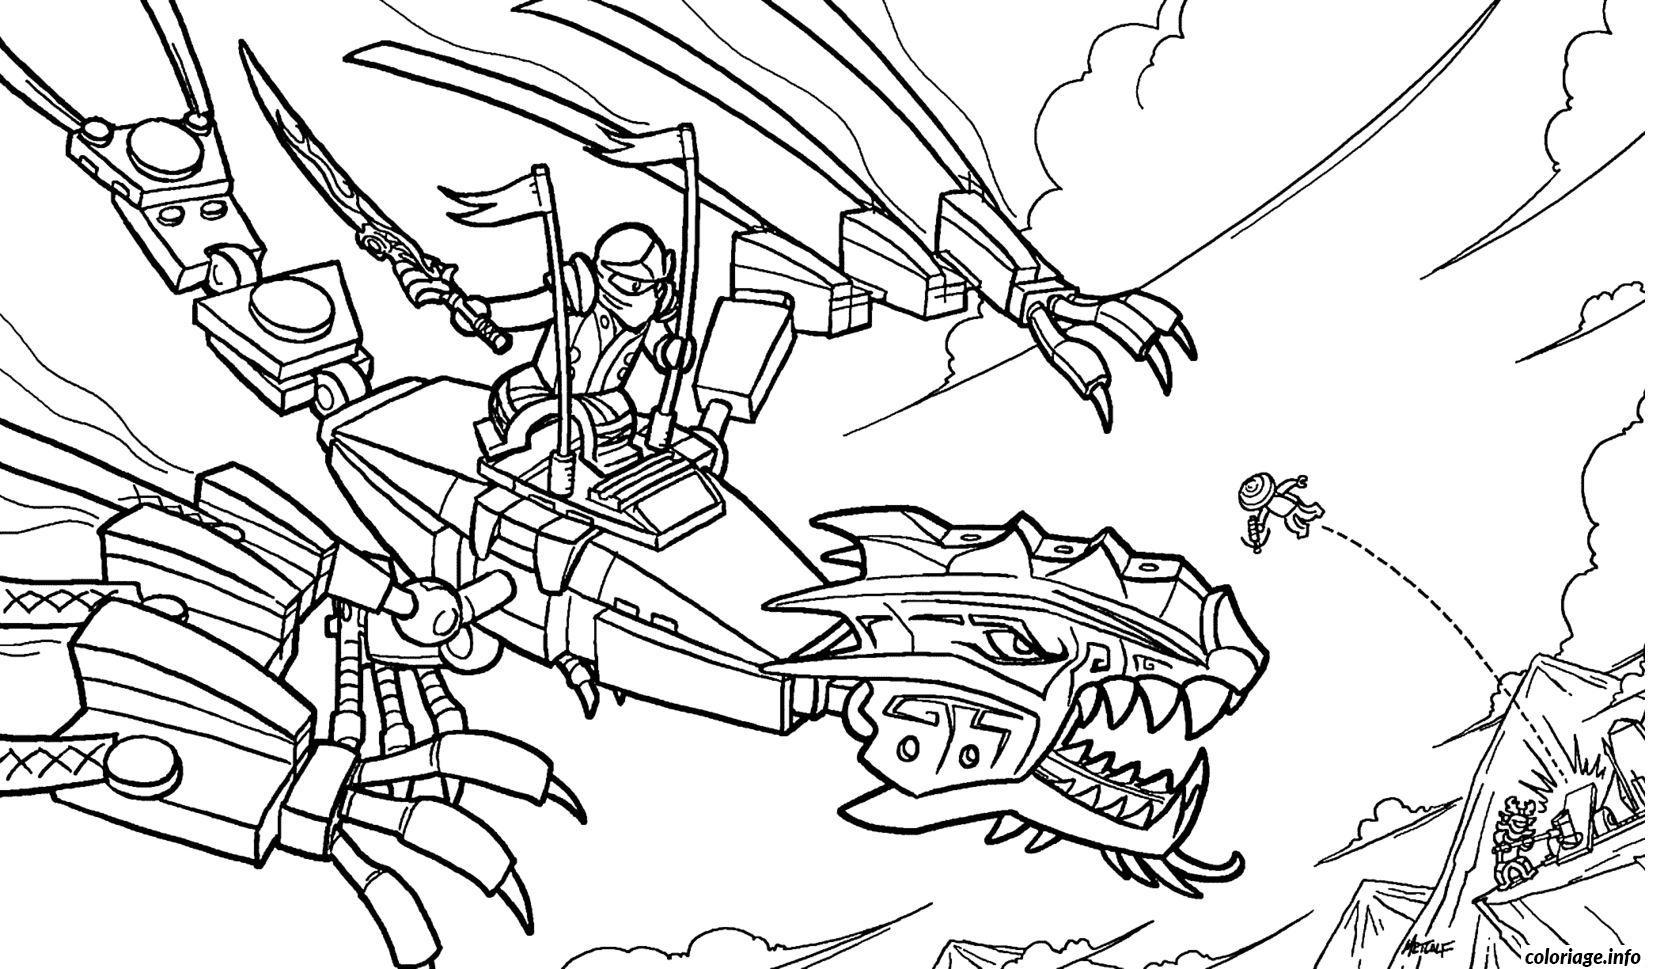 Coloriage ninjago sur un dragon ninja dessin - Ninjago a imprimer ...